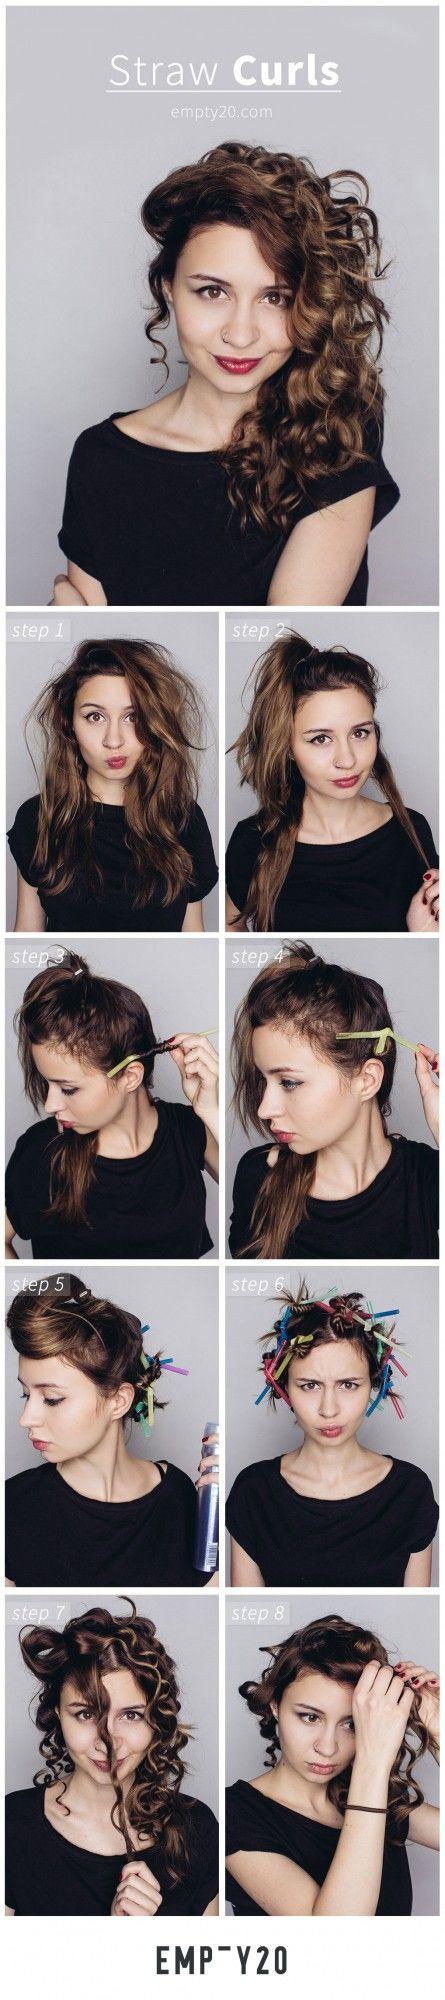 TUTORIAL for Heatless curls using straws